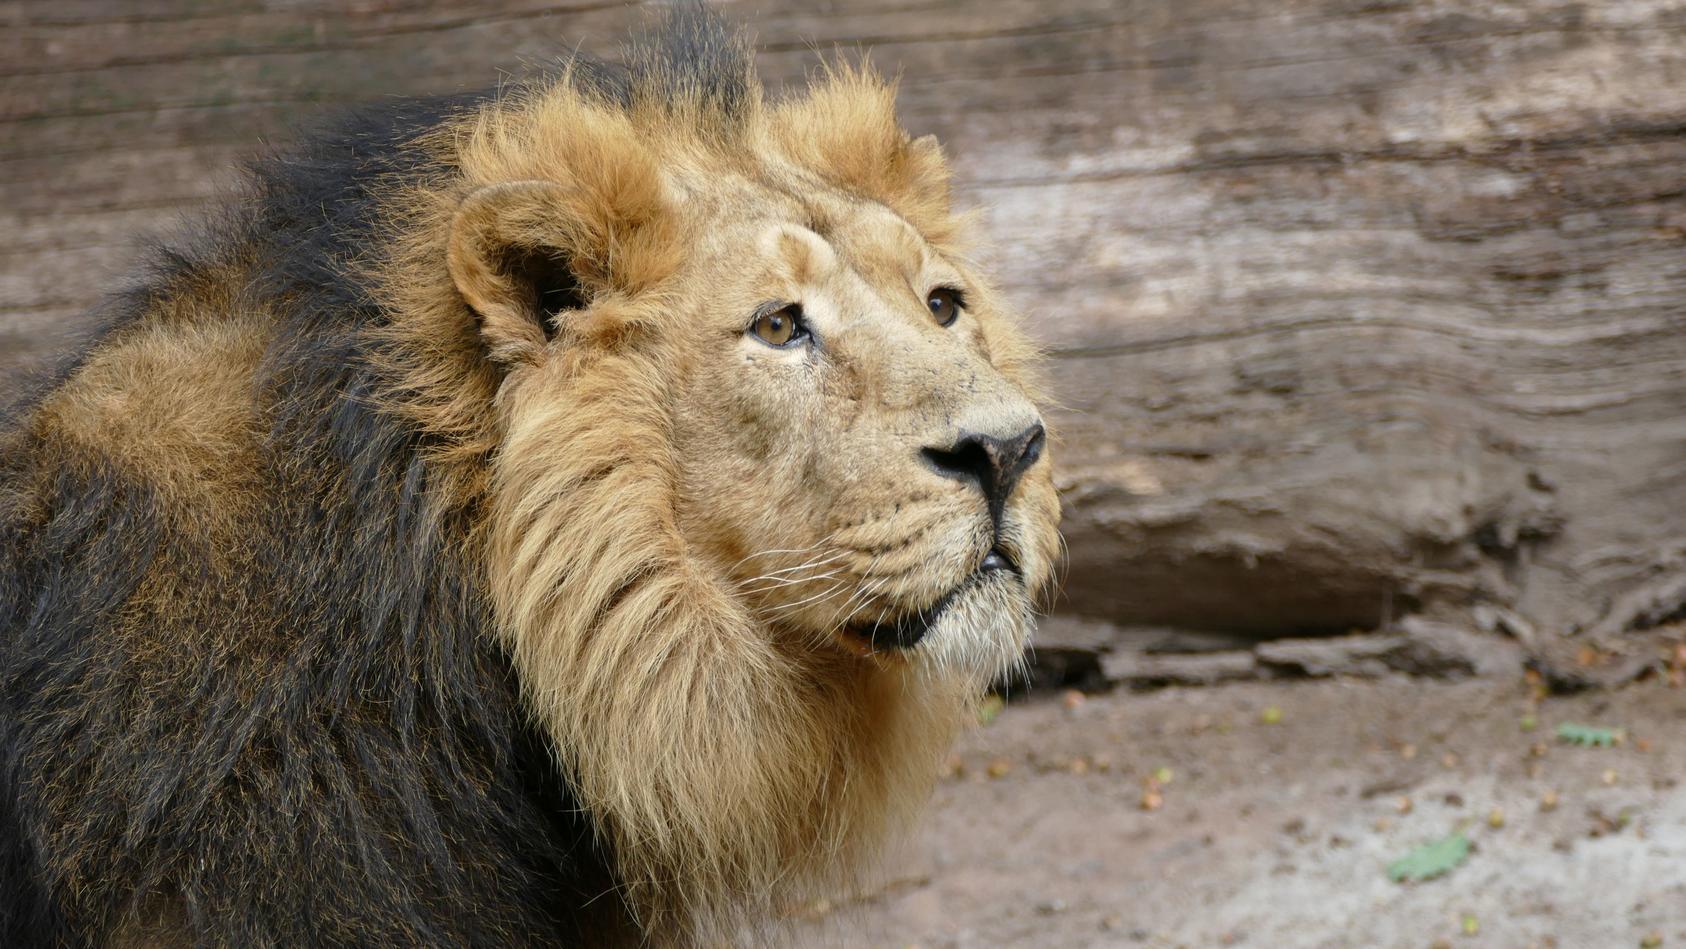 Löwenmännchen Subali im Nürnberger Tiergarten